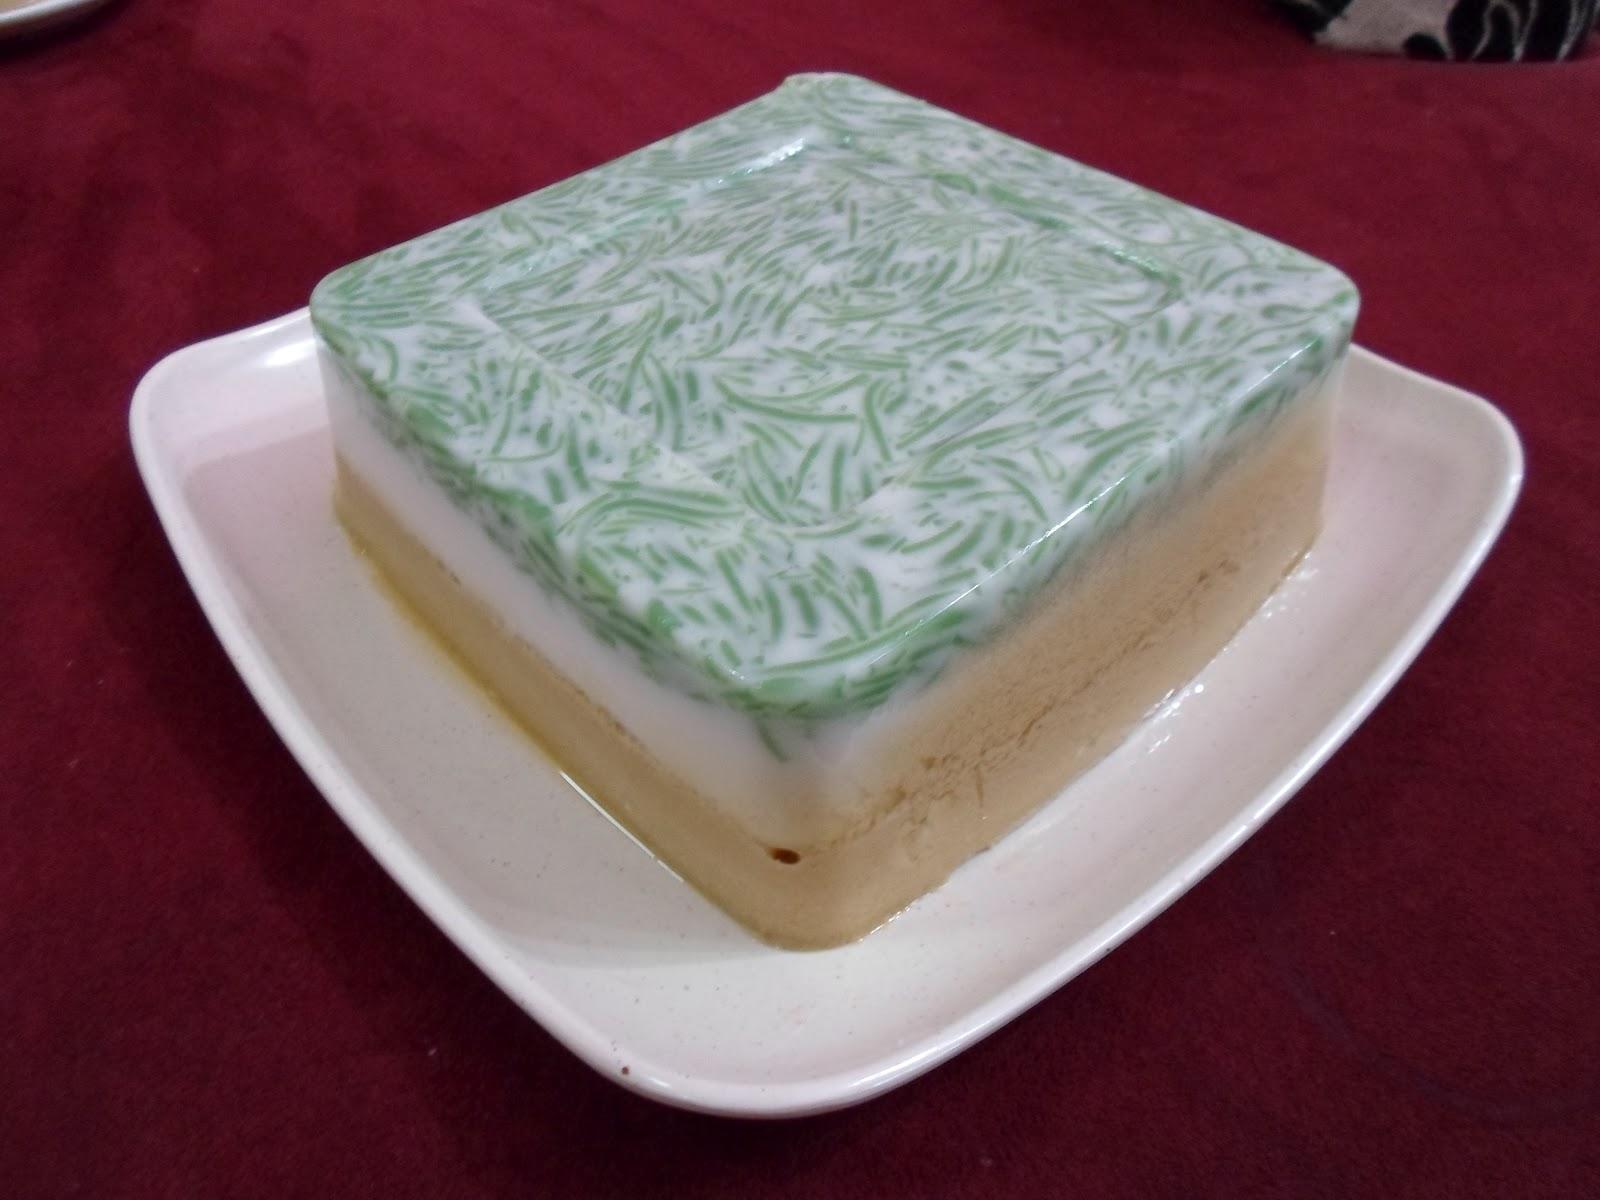 Gula Hangus ( 002177897 - D ): Resepi Puding Cendol Gula Melaka Bersantan.